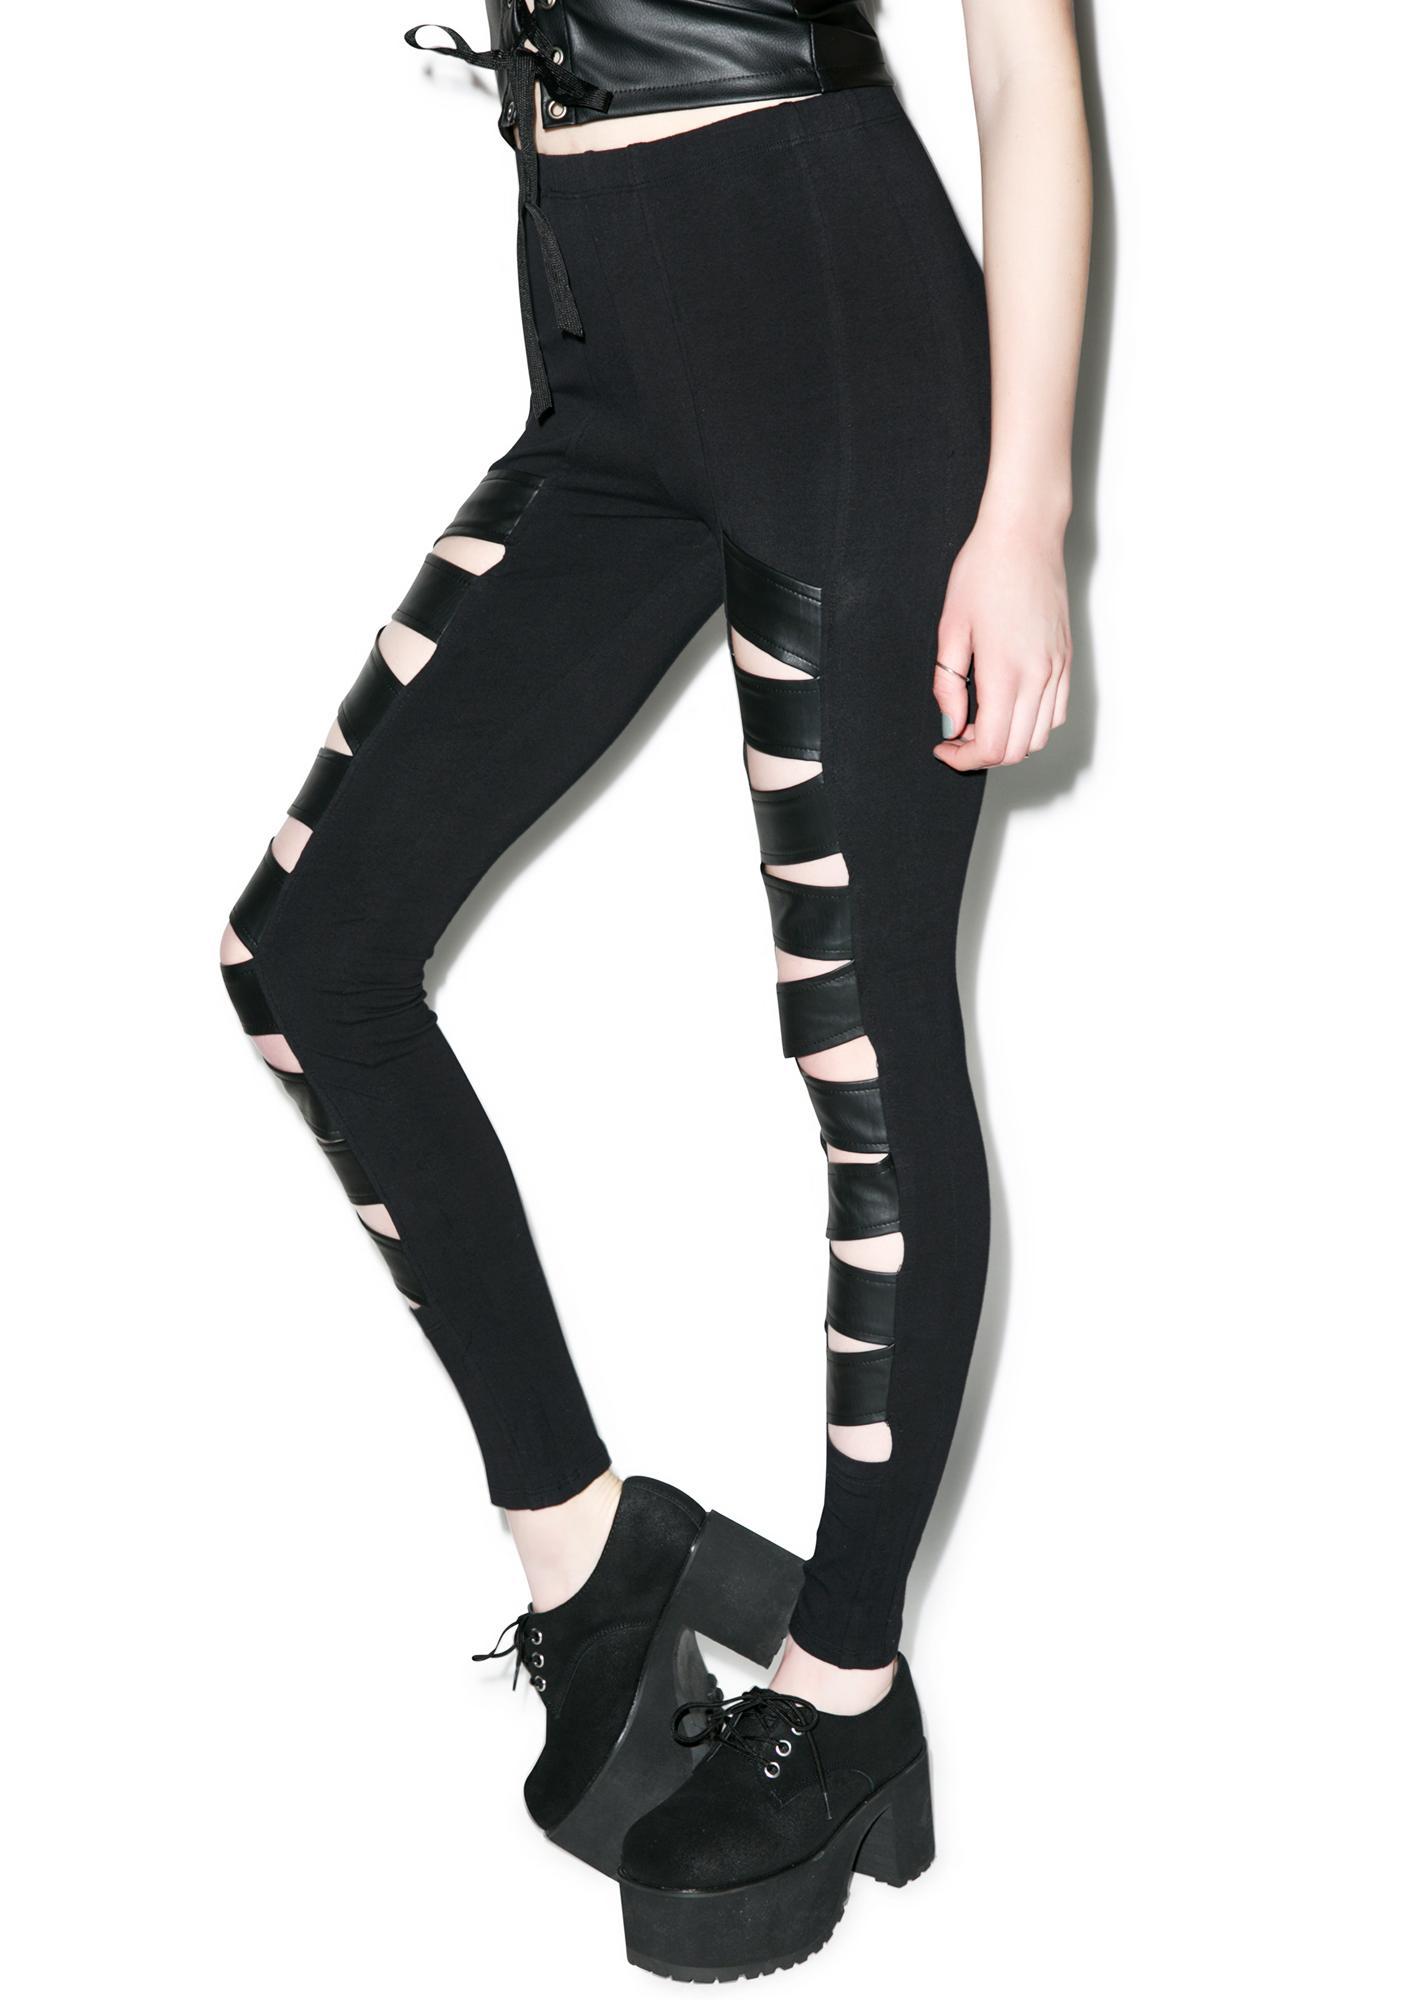 Tripp NYC Z-Cut Leggings